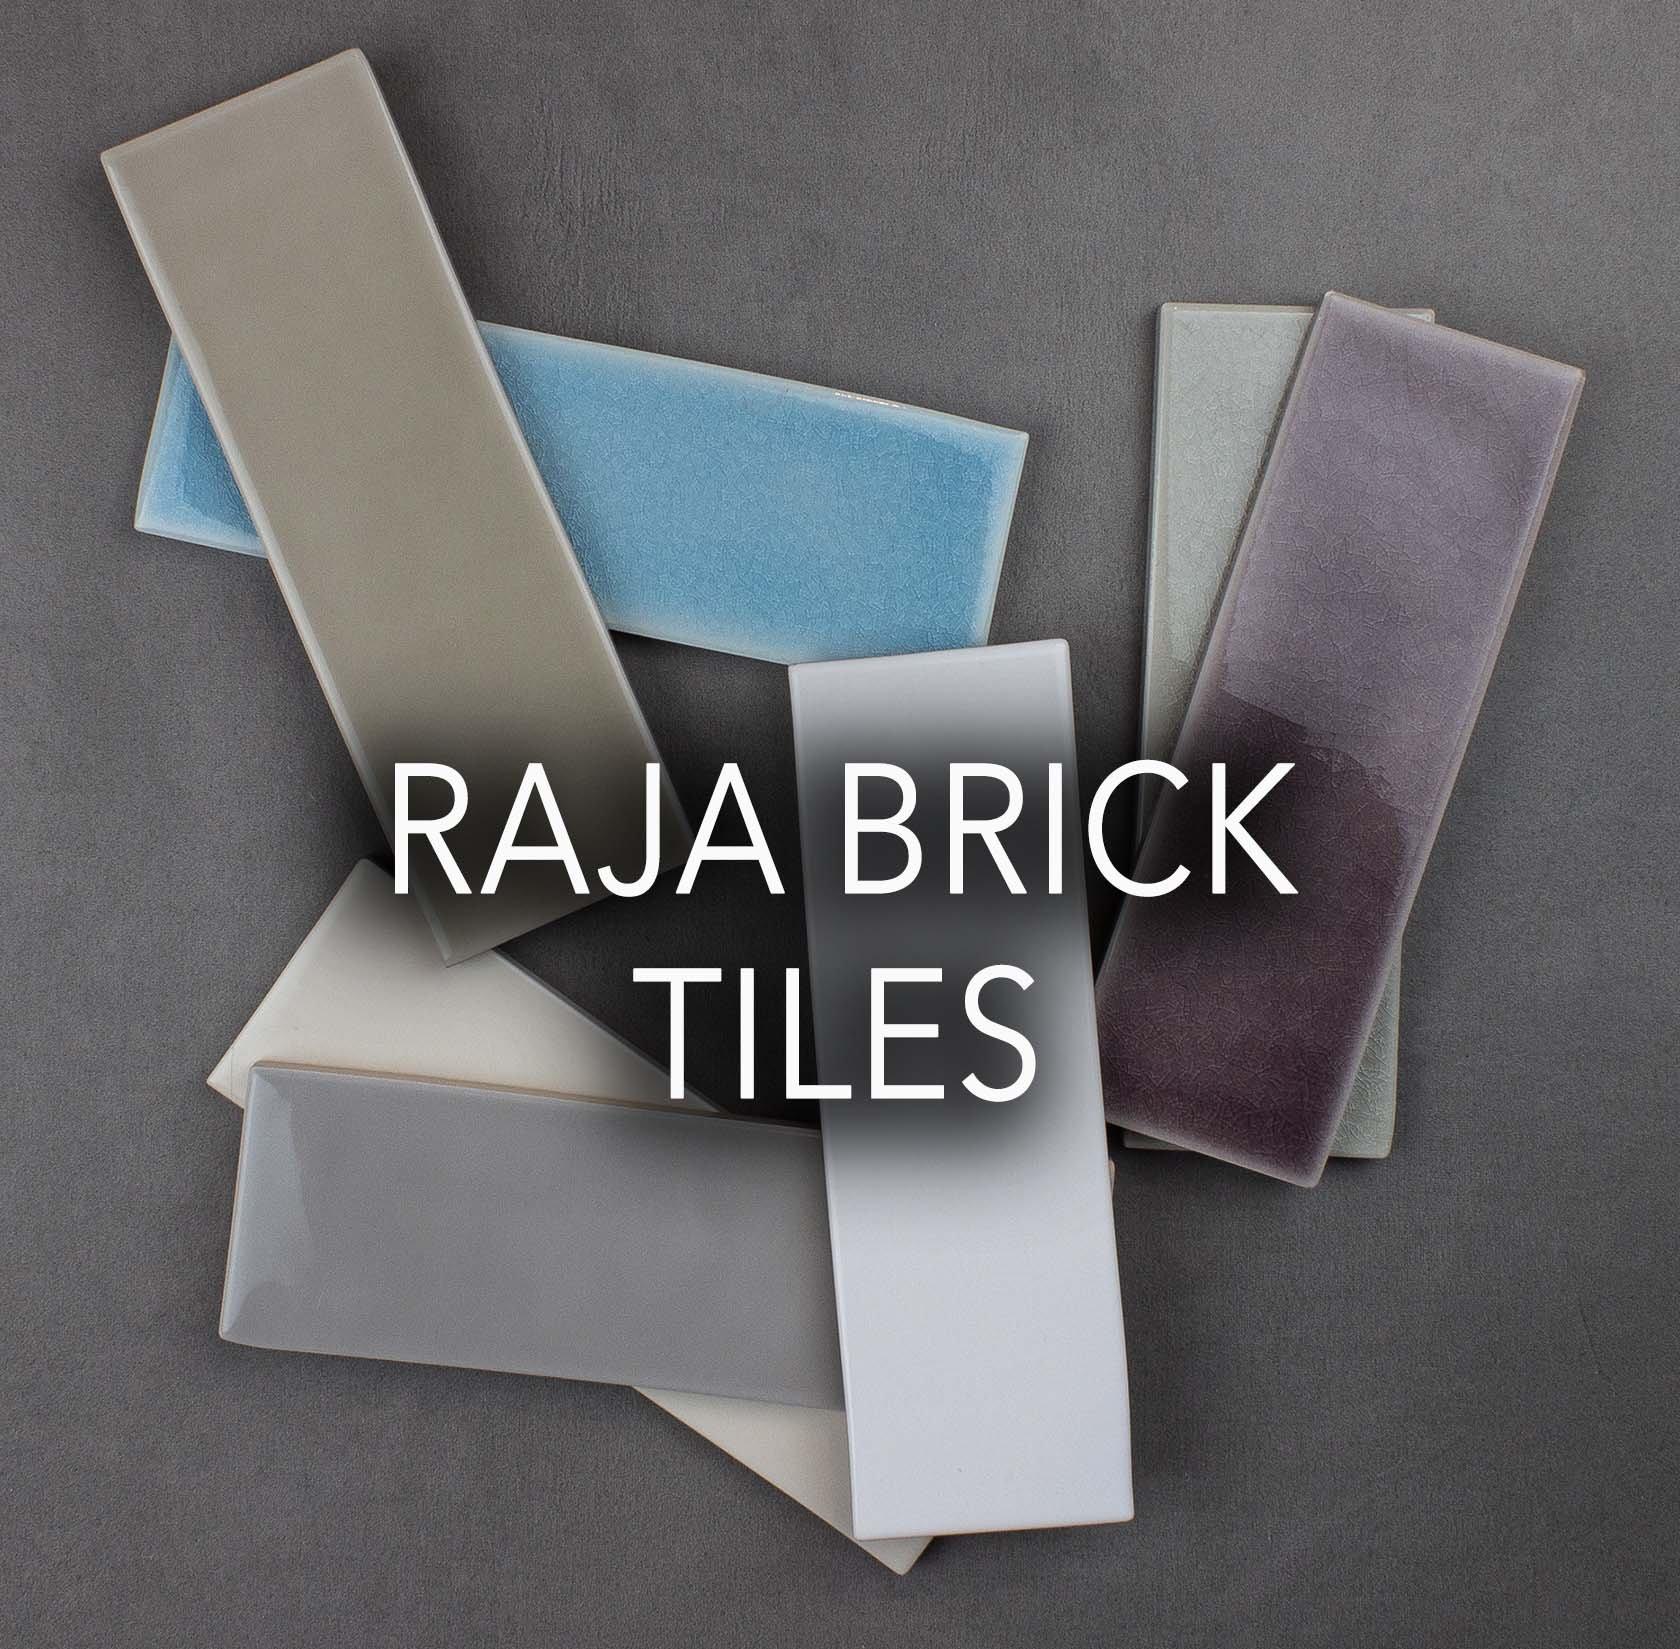 Raja Brick Tiles